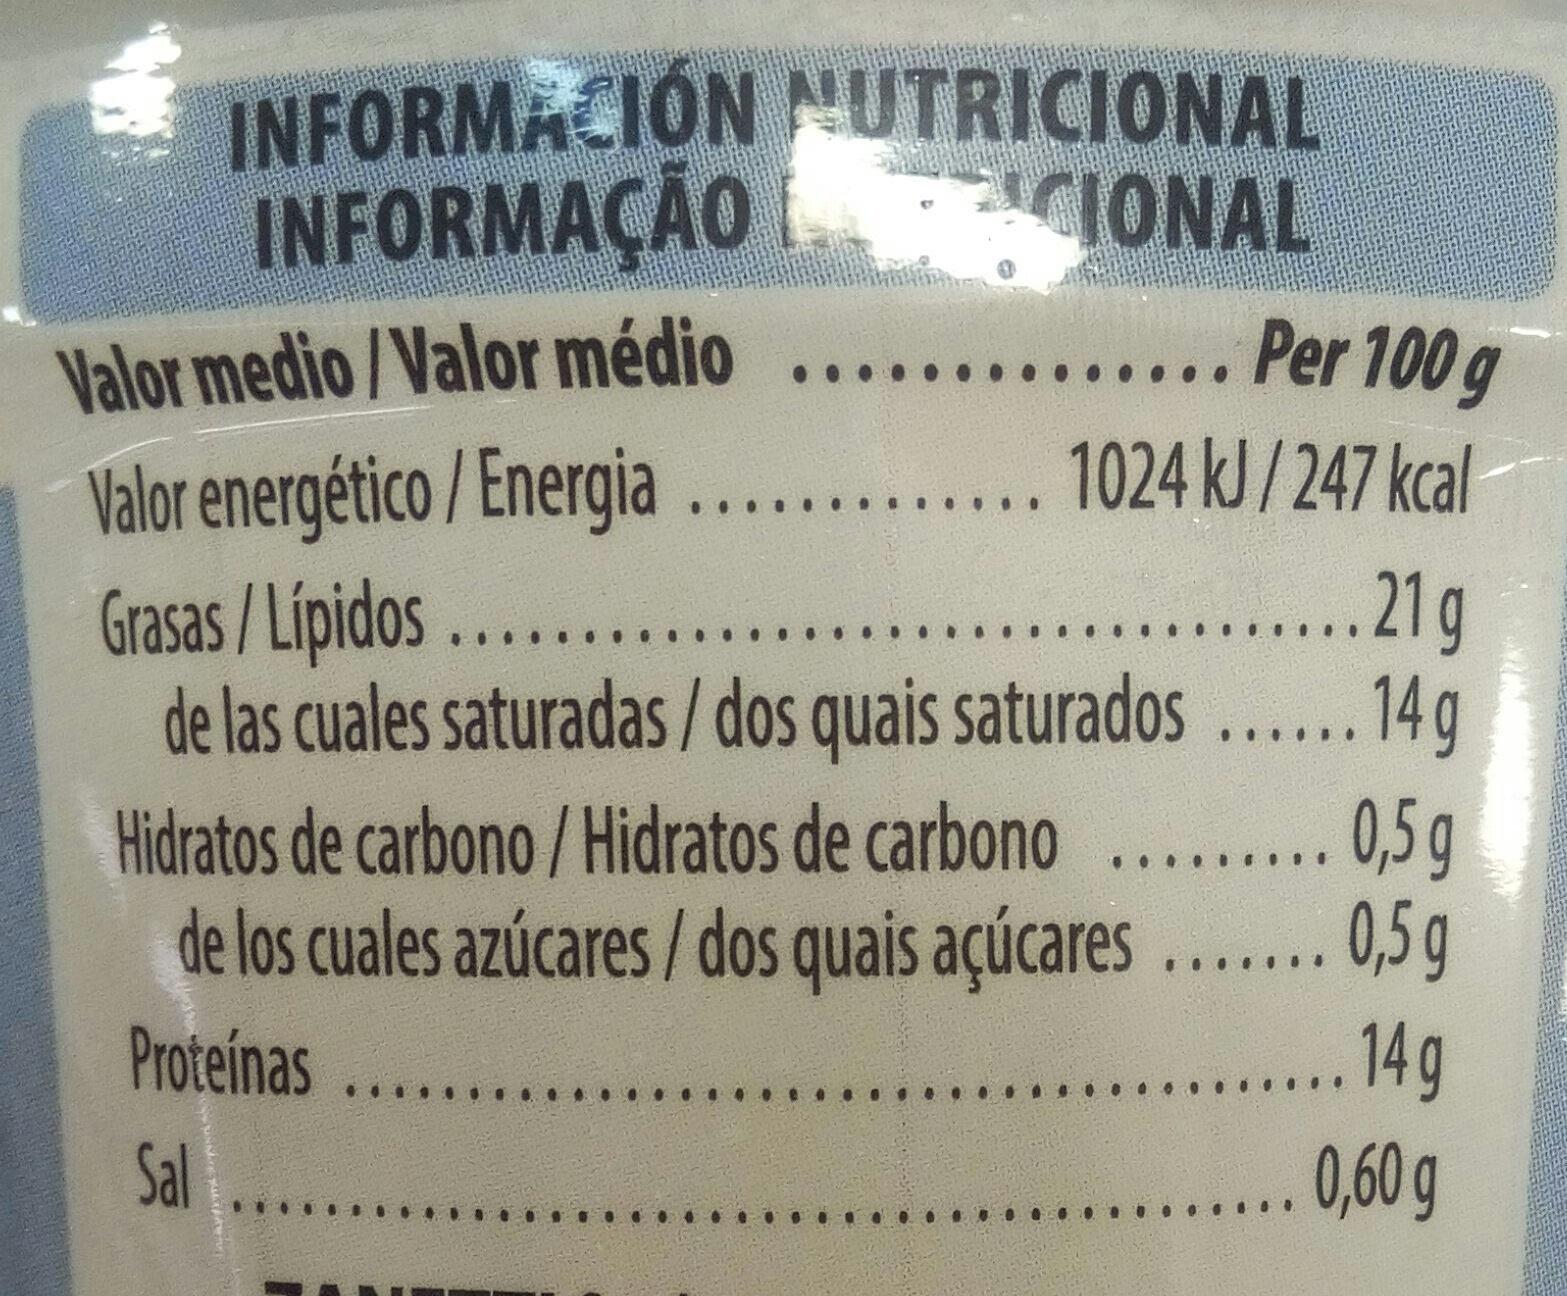 Mozzarella di bufala campana - Nutrition facts - es